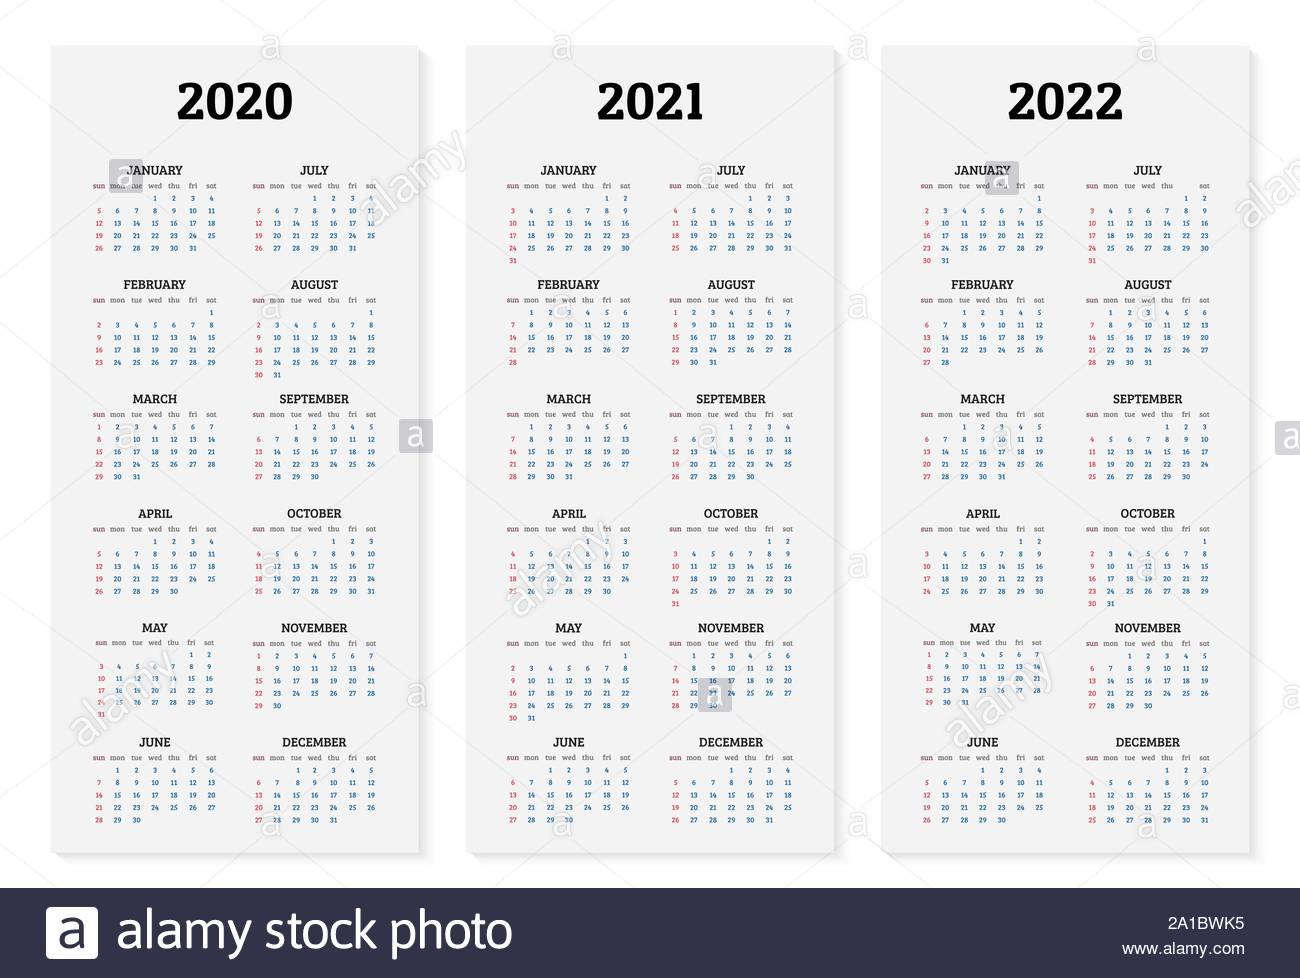 Year 2022 Vector Vectors Stock Photos & Year 2022 Vector in Free Printable Calendar 2020-2022